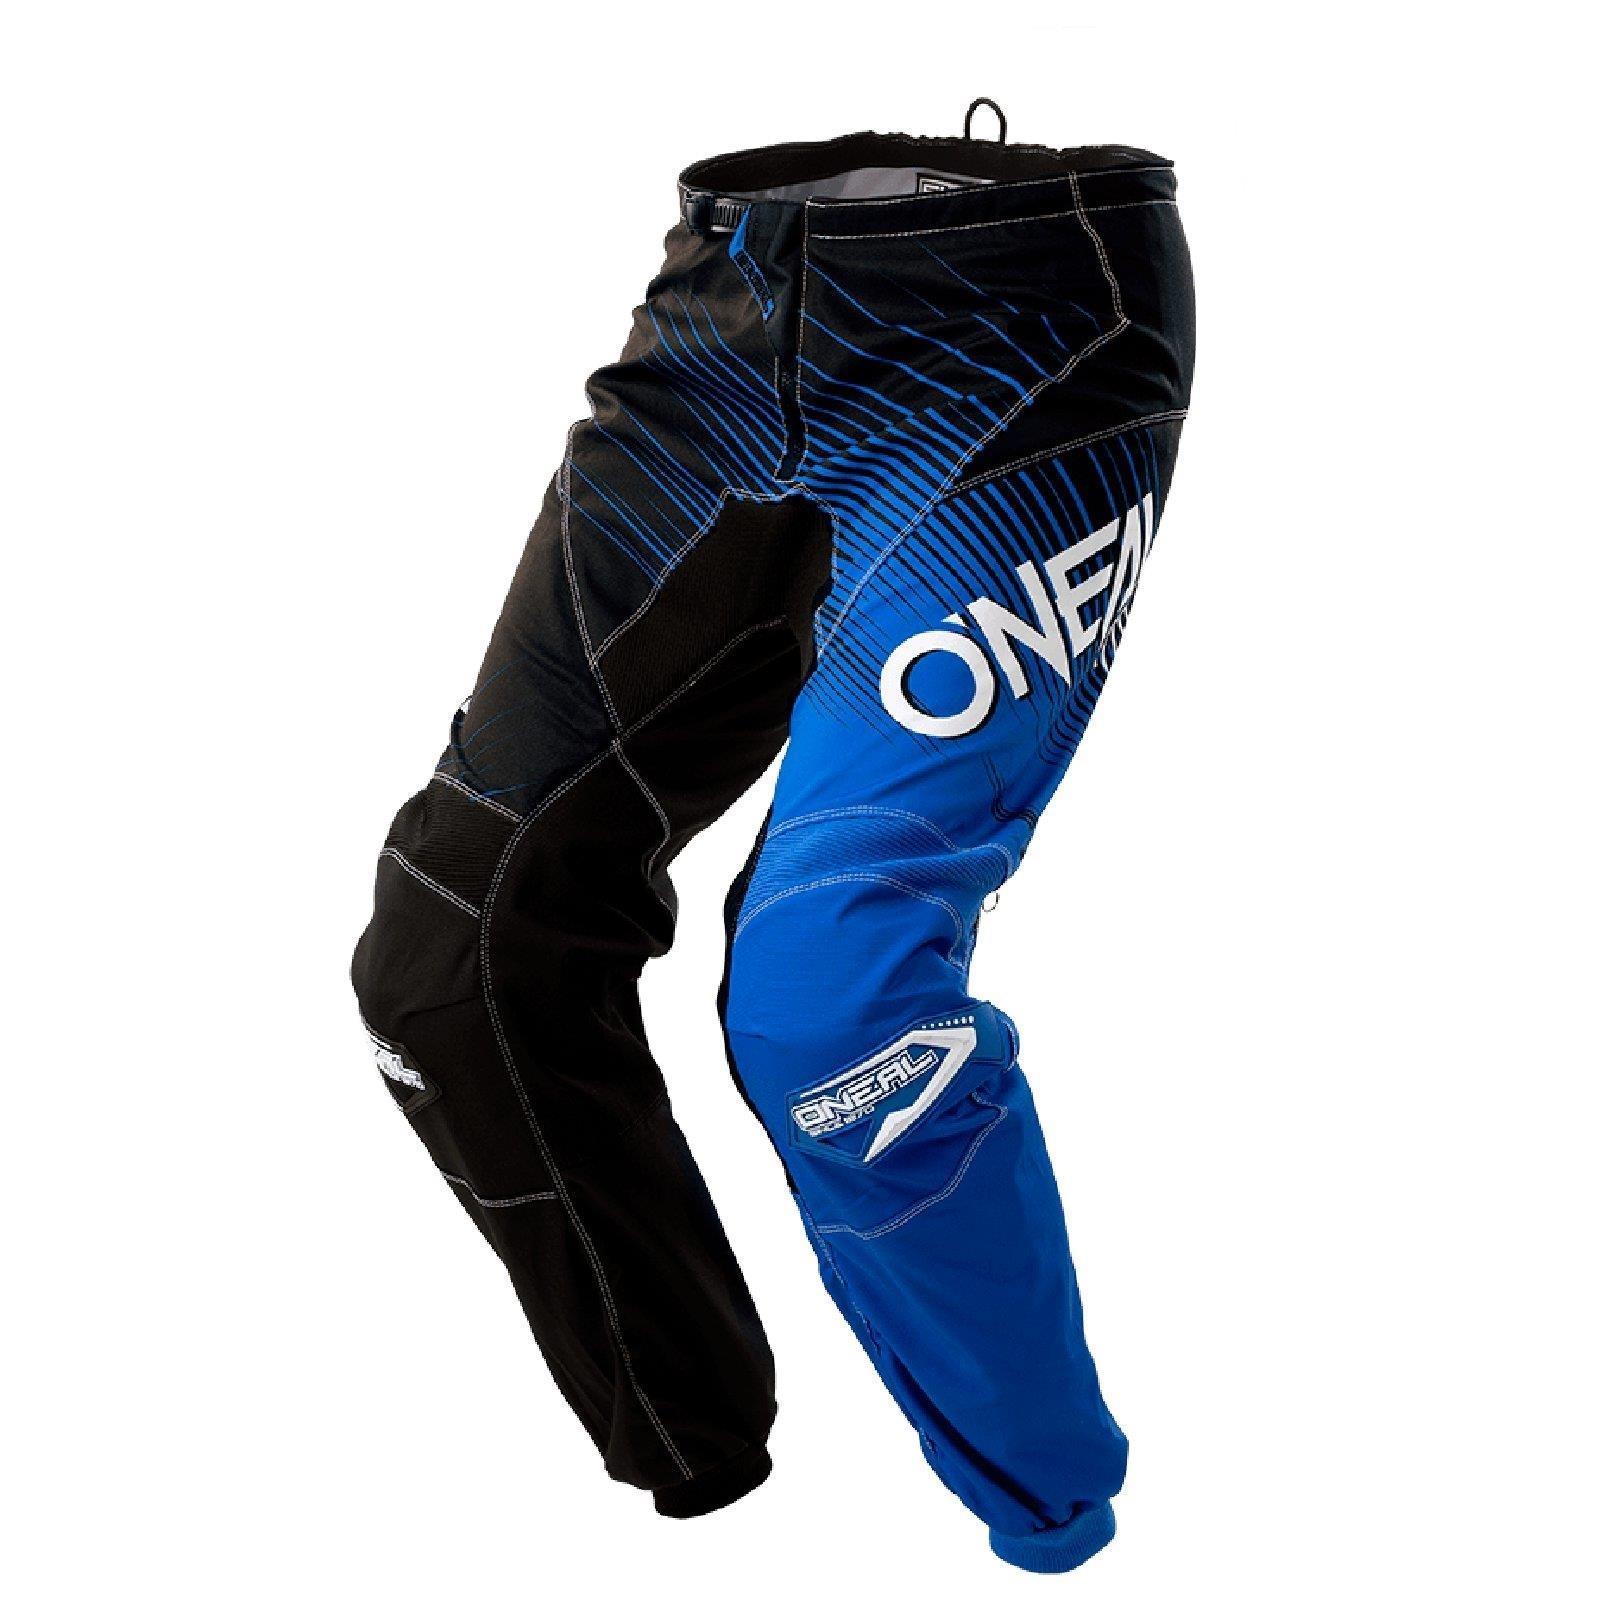 Elemento-oNeal-racewear-Jersey-pantalones-a-ninos-adulto-Motocross-Enduro-downhill miniatura 16